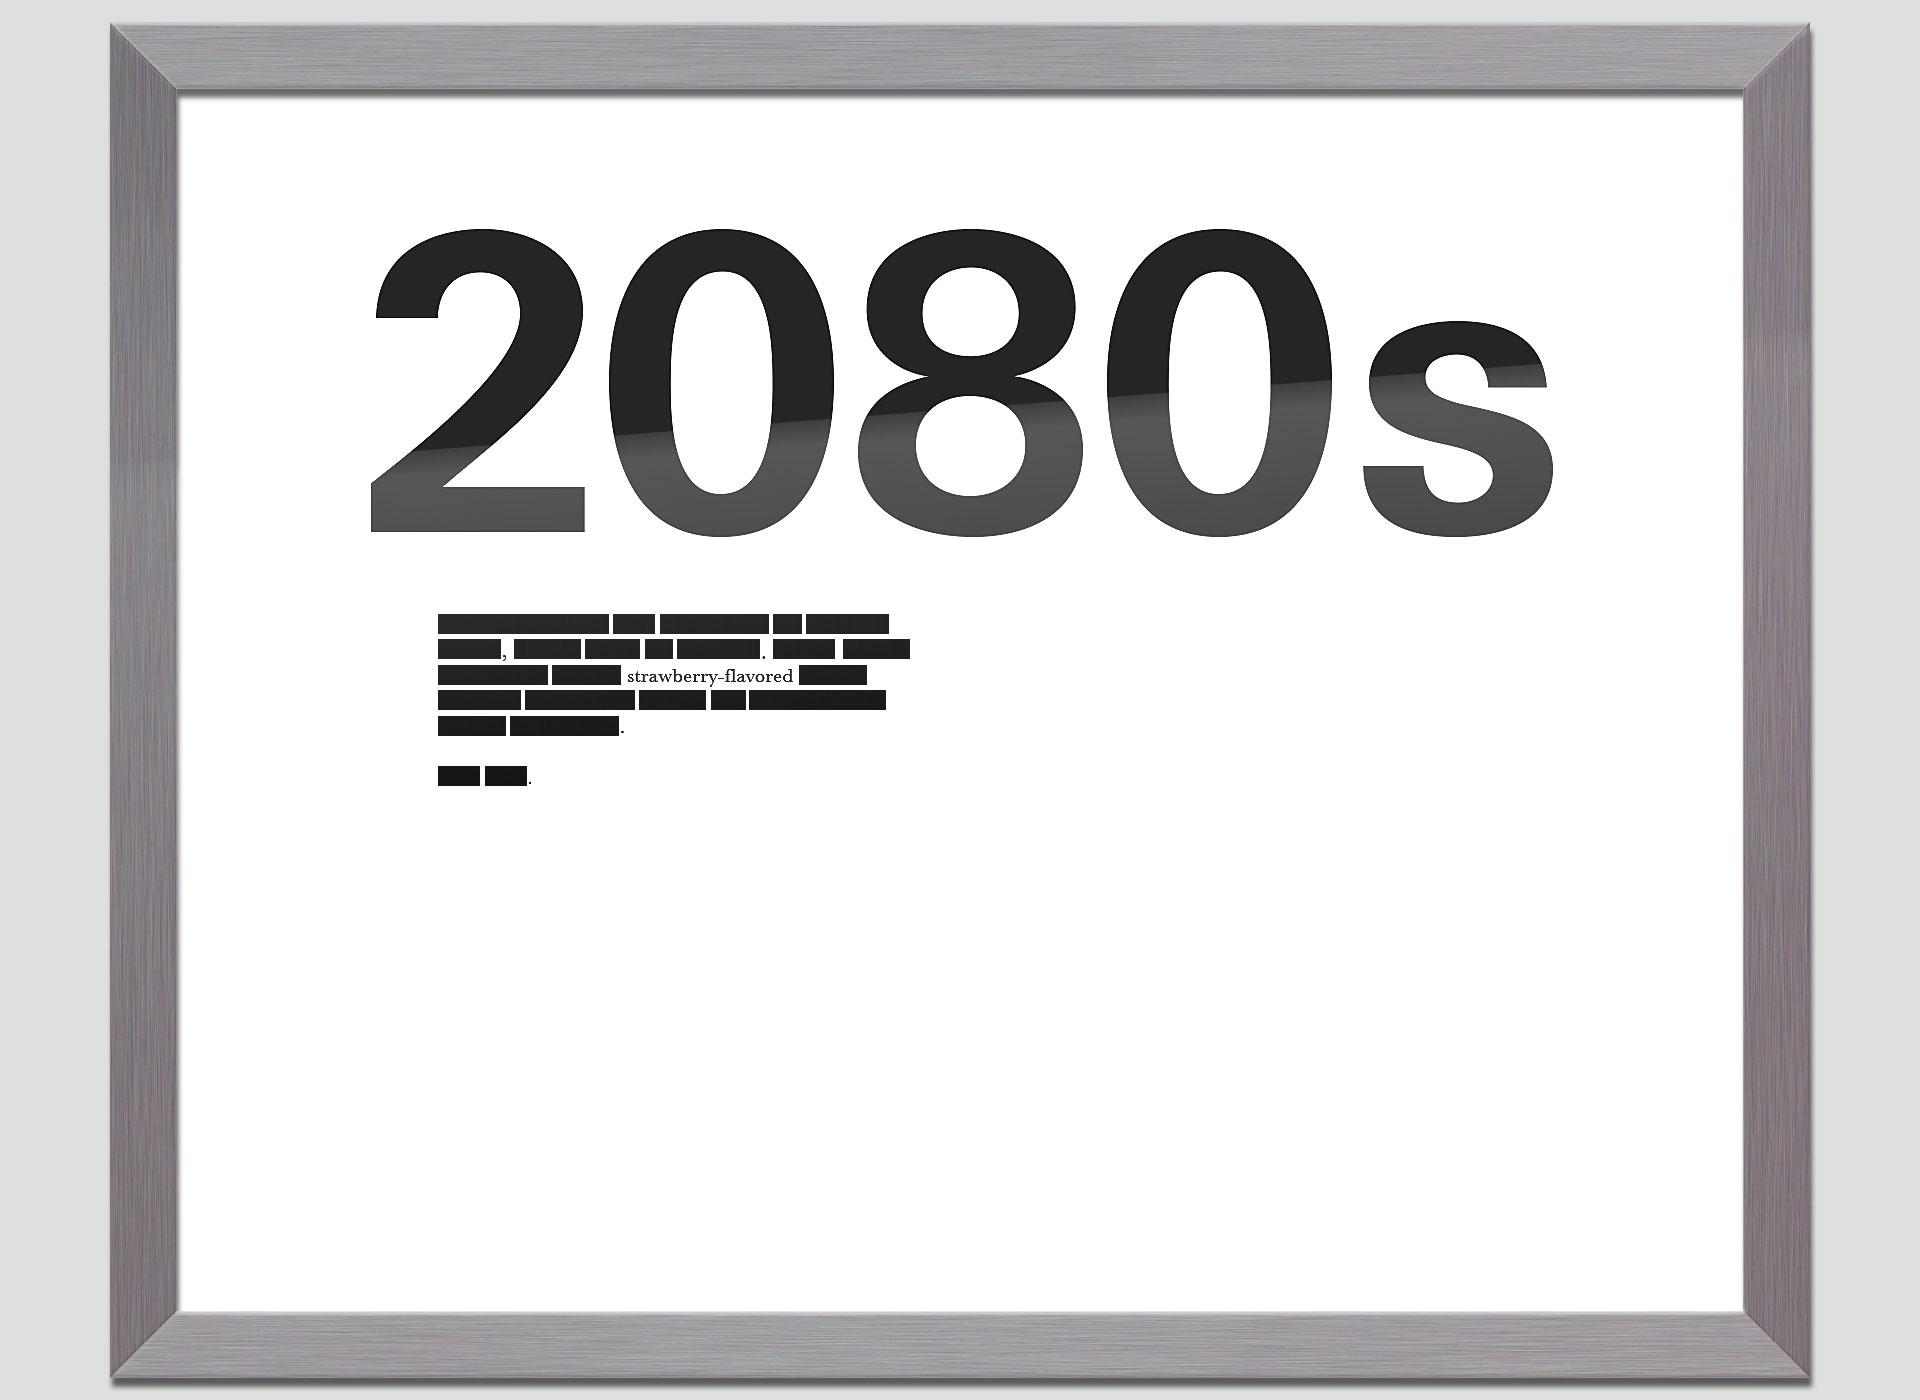 everything-decades-2080@2x.jpg